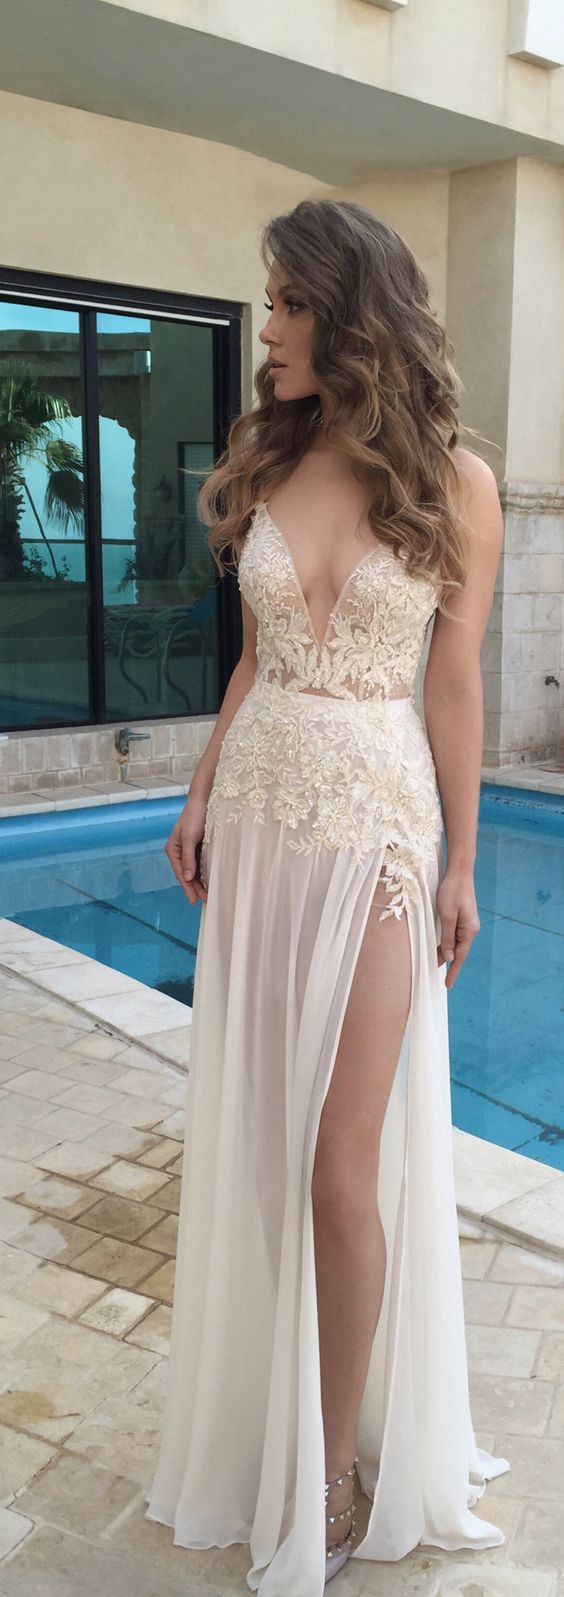 2017 Custom Made Charming White Lace Beaded Prom Dress,Spaghetti ...